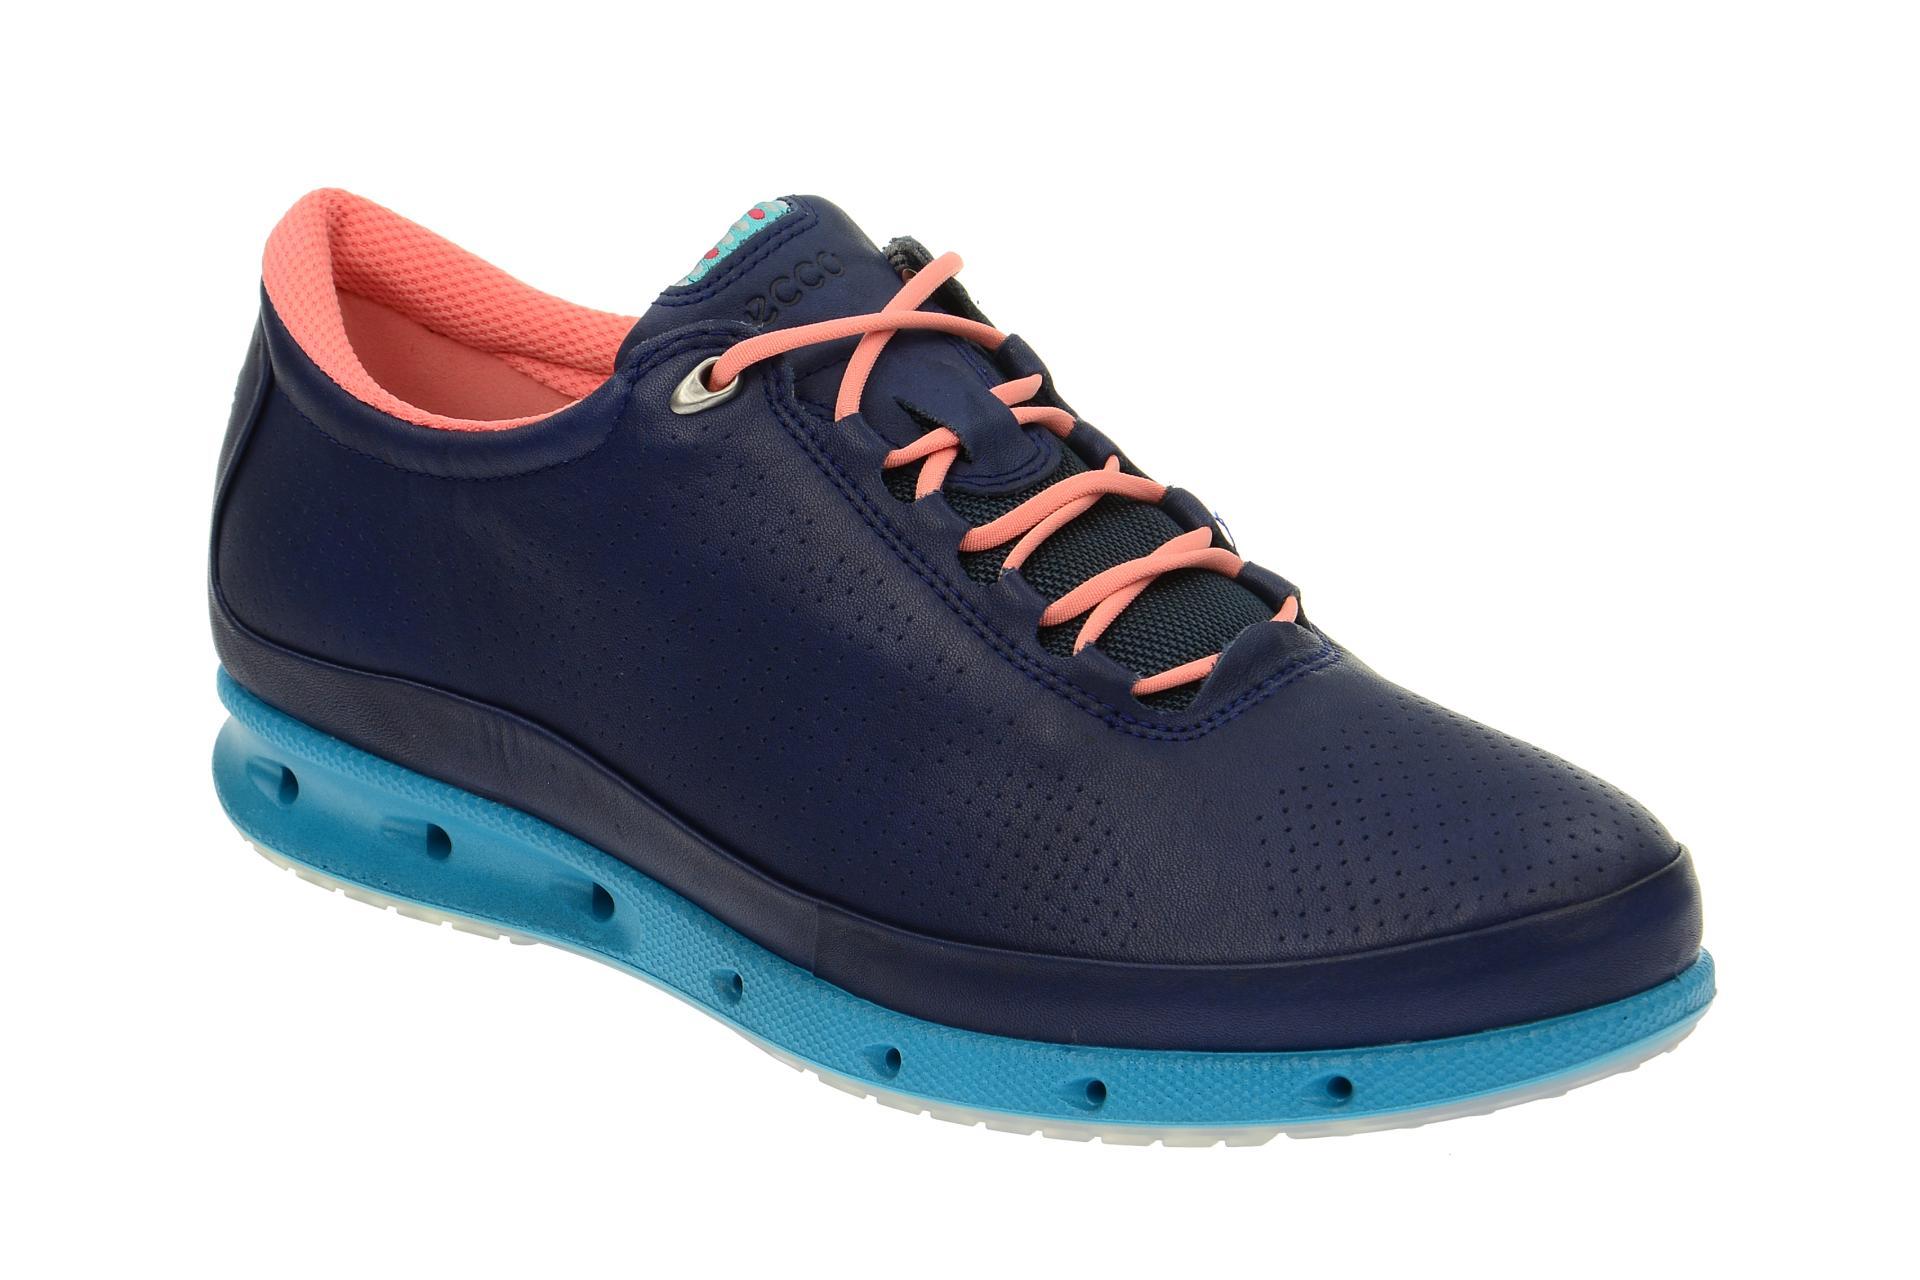 finest selection c3421 d1e2a Ecco Cool Schuhe blau true-navy 83130301048